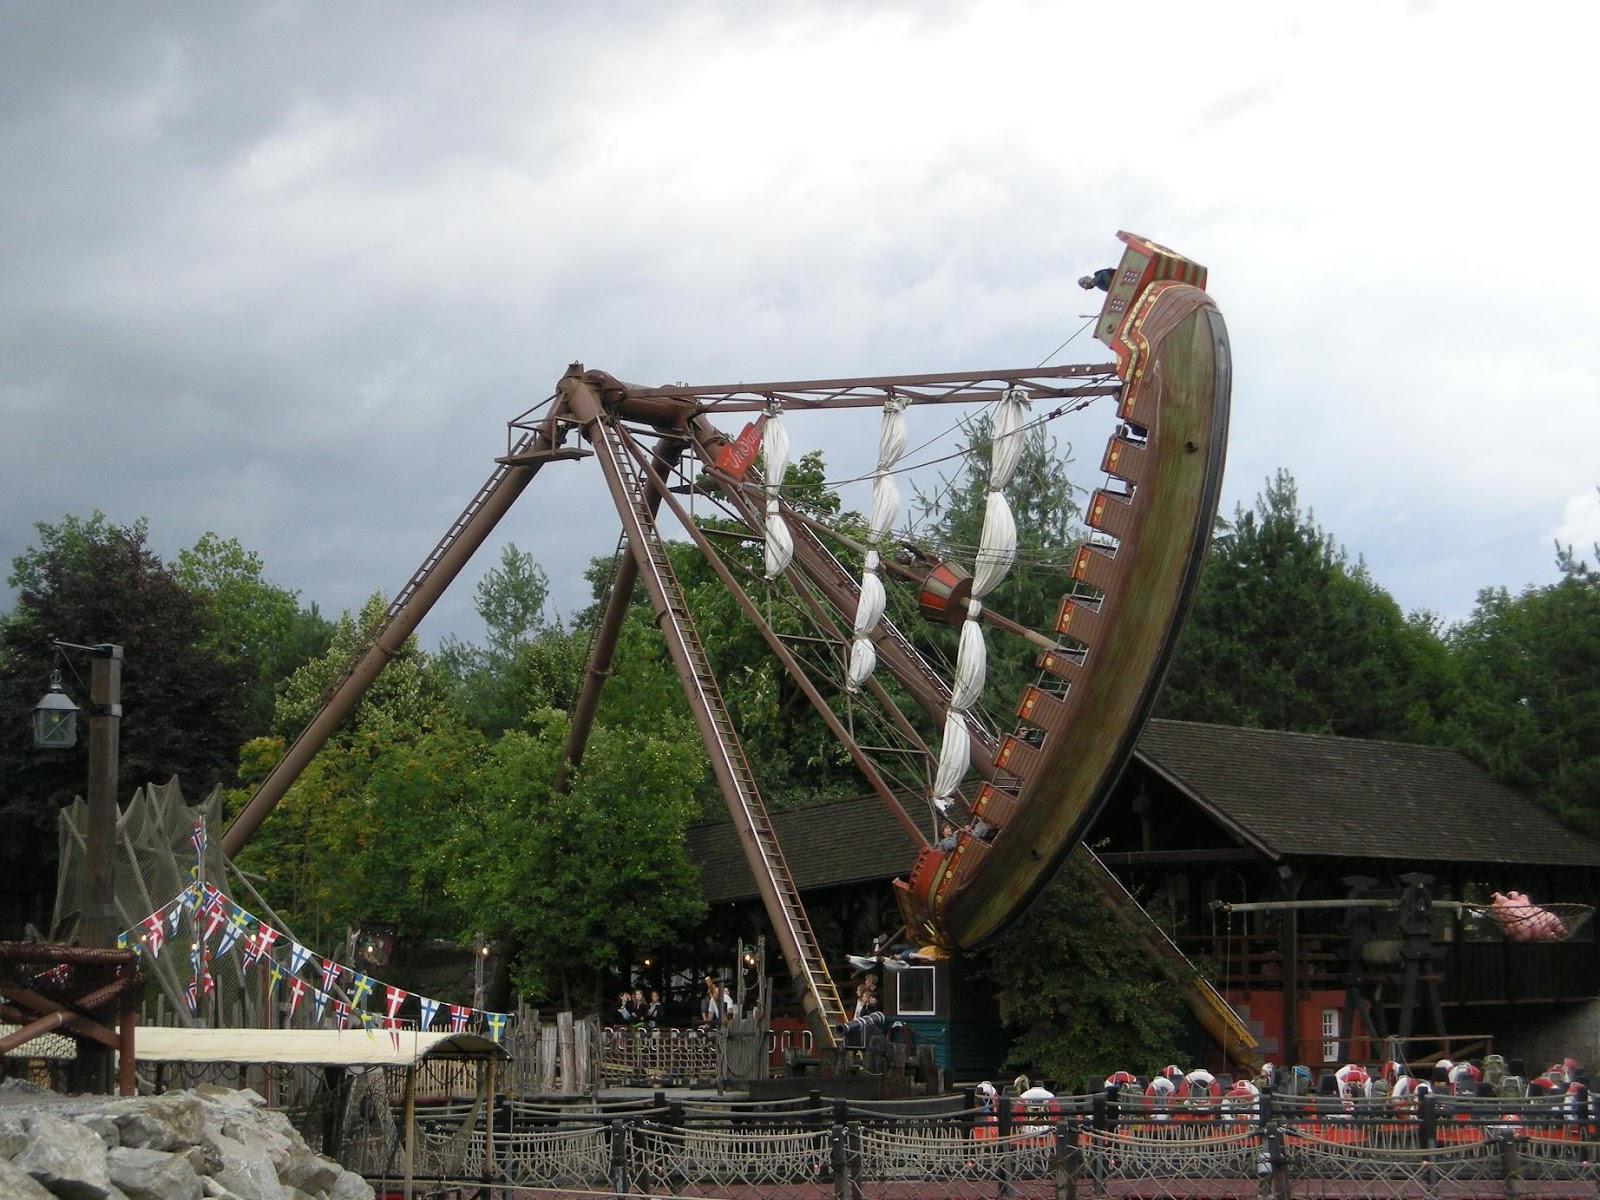 parc attraction kehl